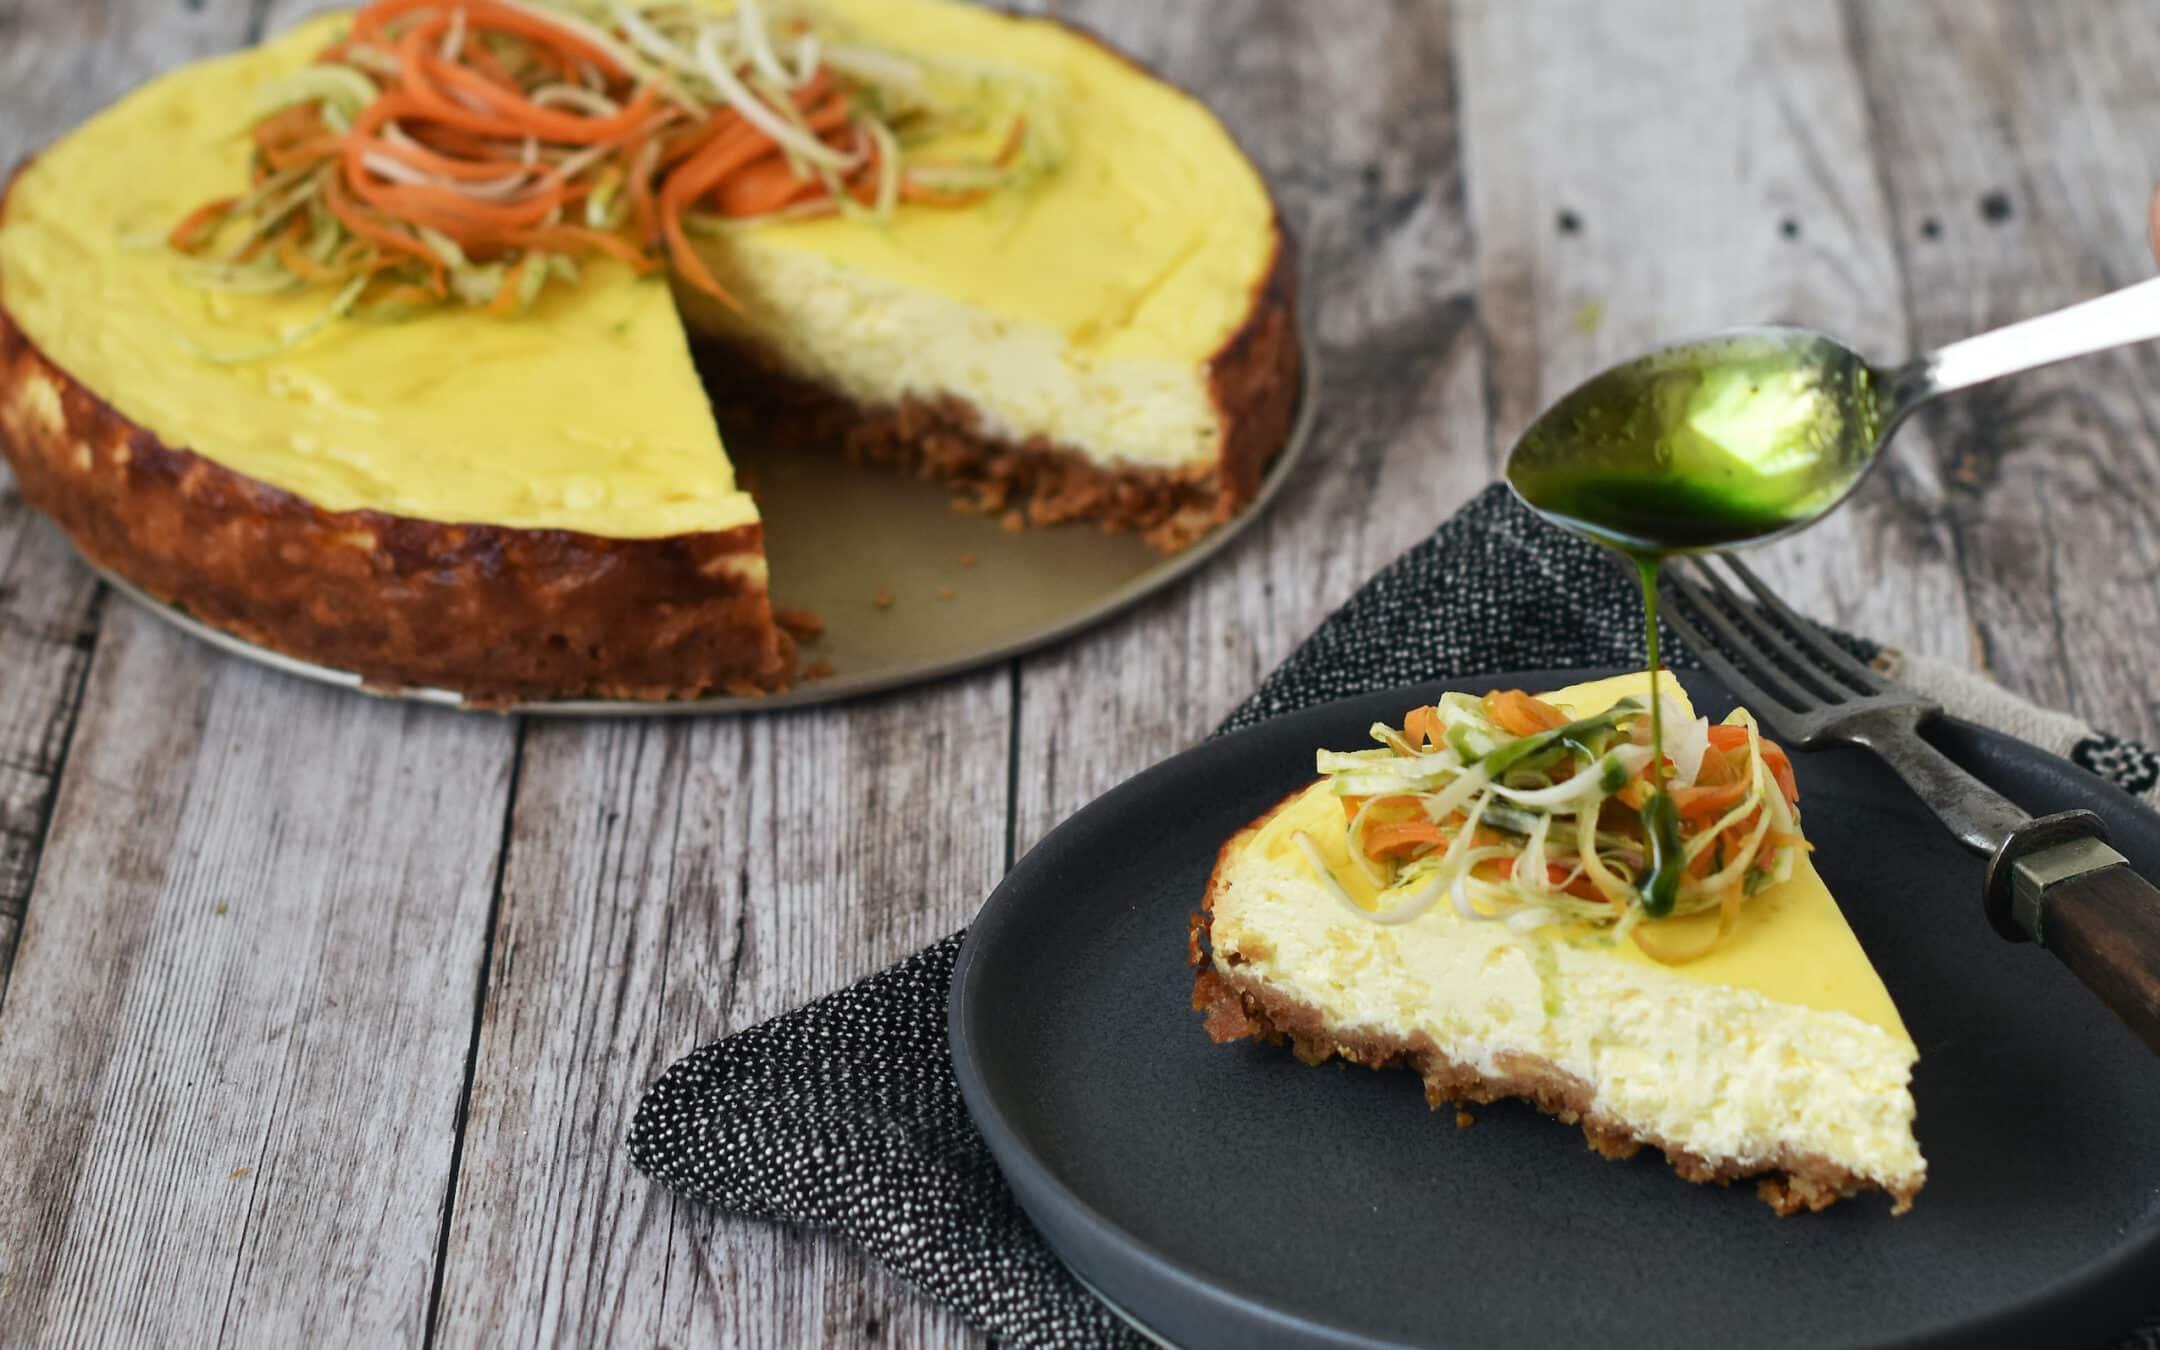 Salt cheesecake med syltet grønt, timianolie og ostefladbrød